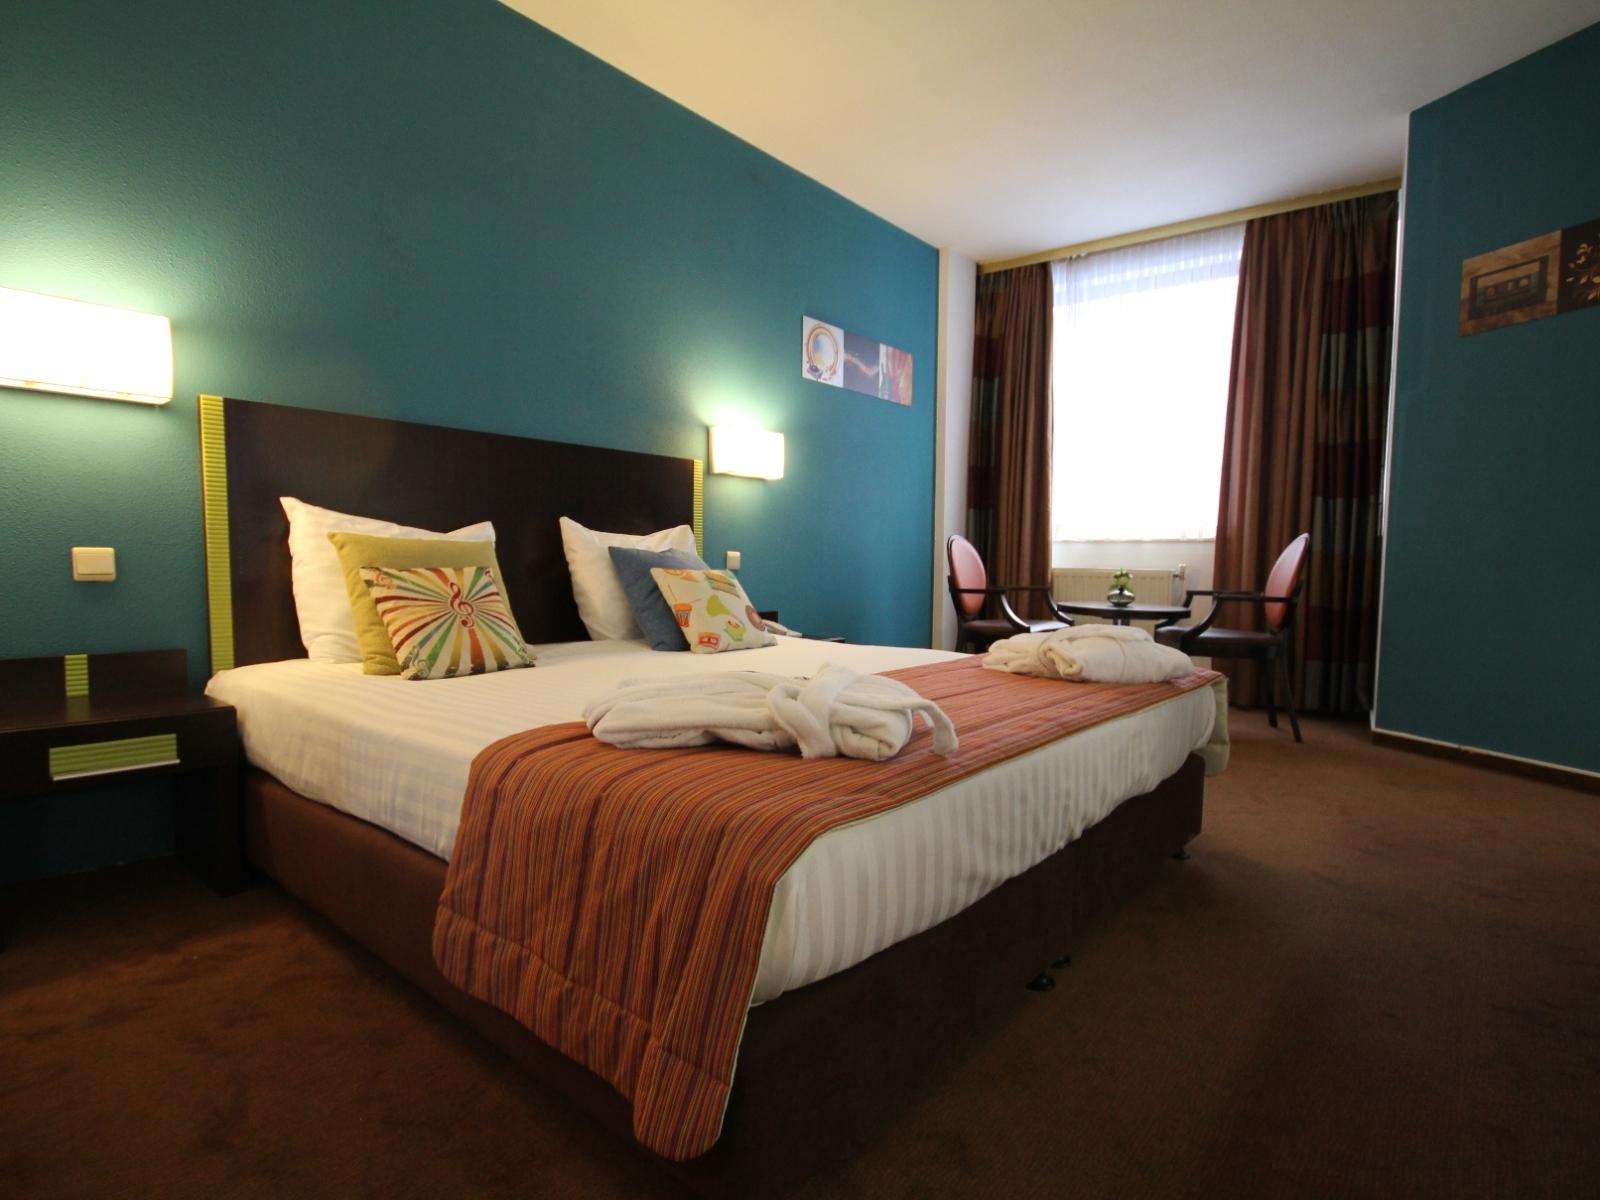 hotel-floris-arlequin-grand-place thumbnail